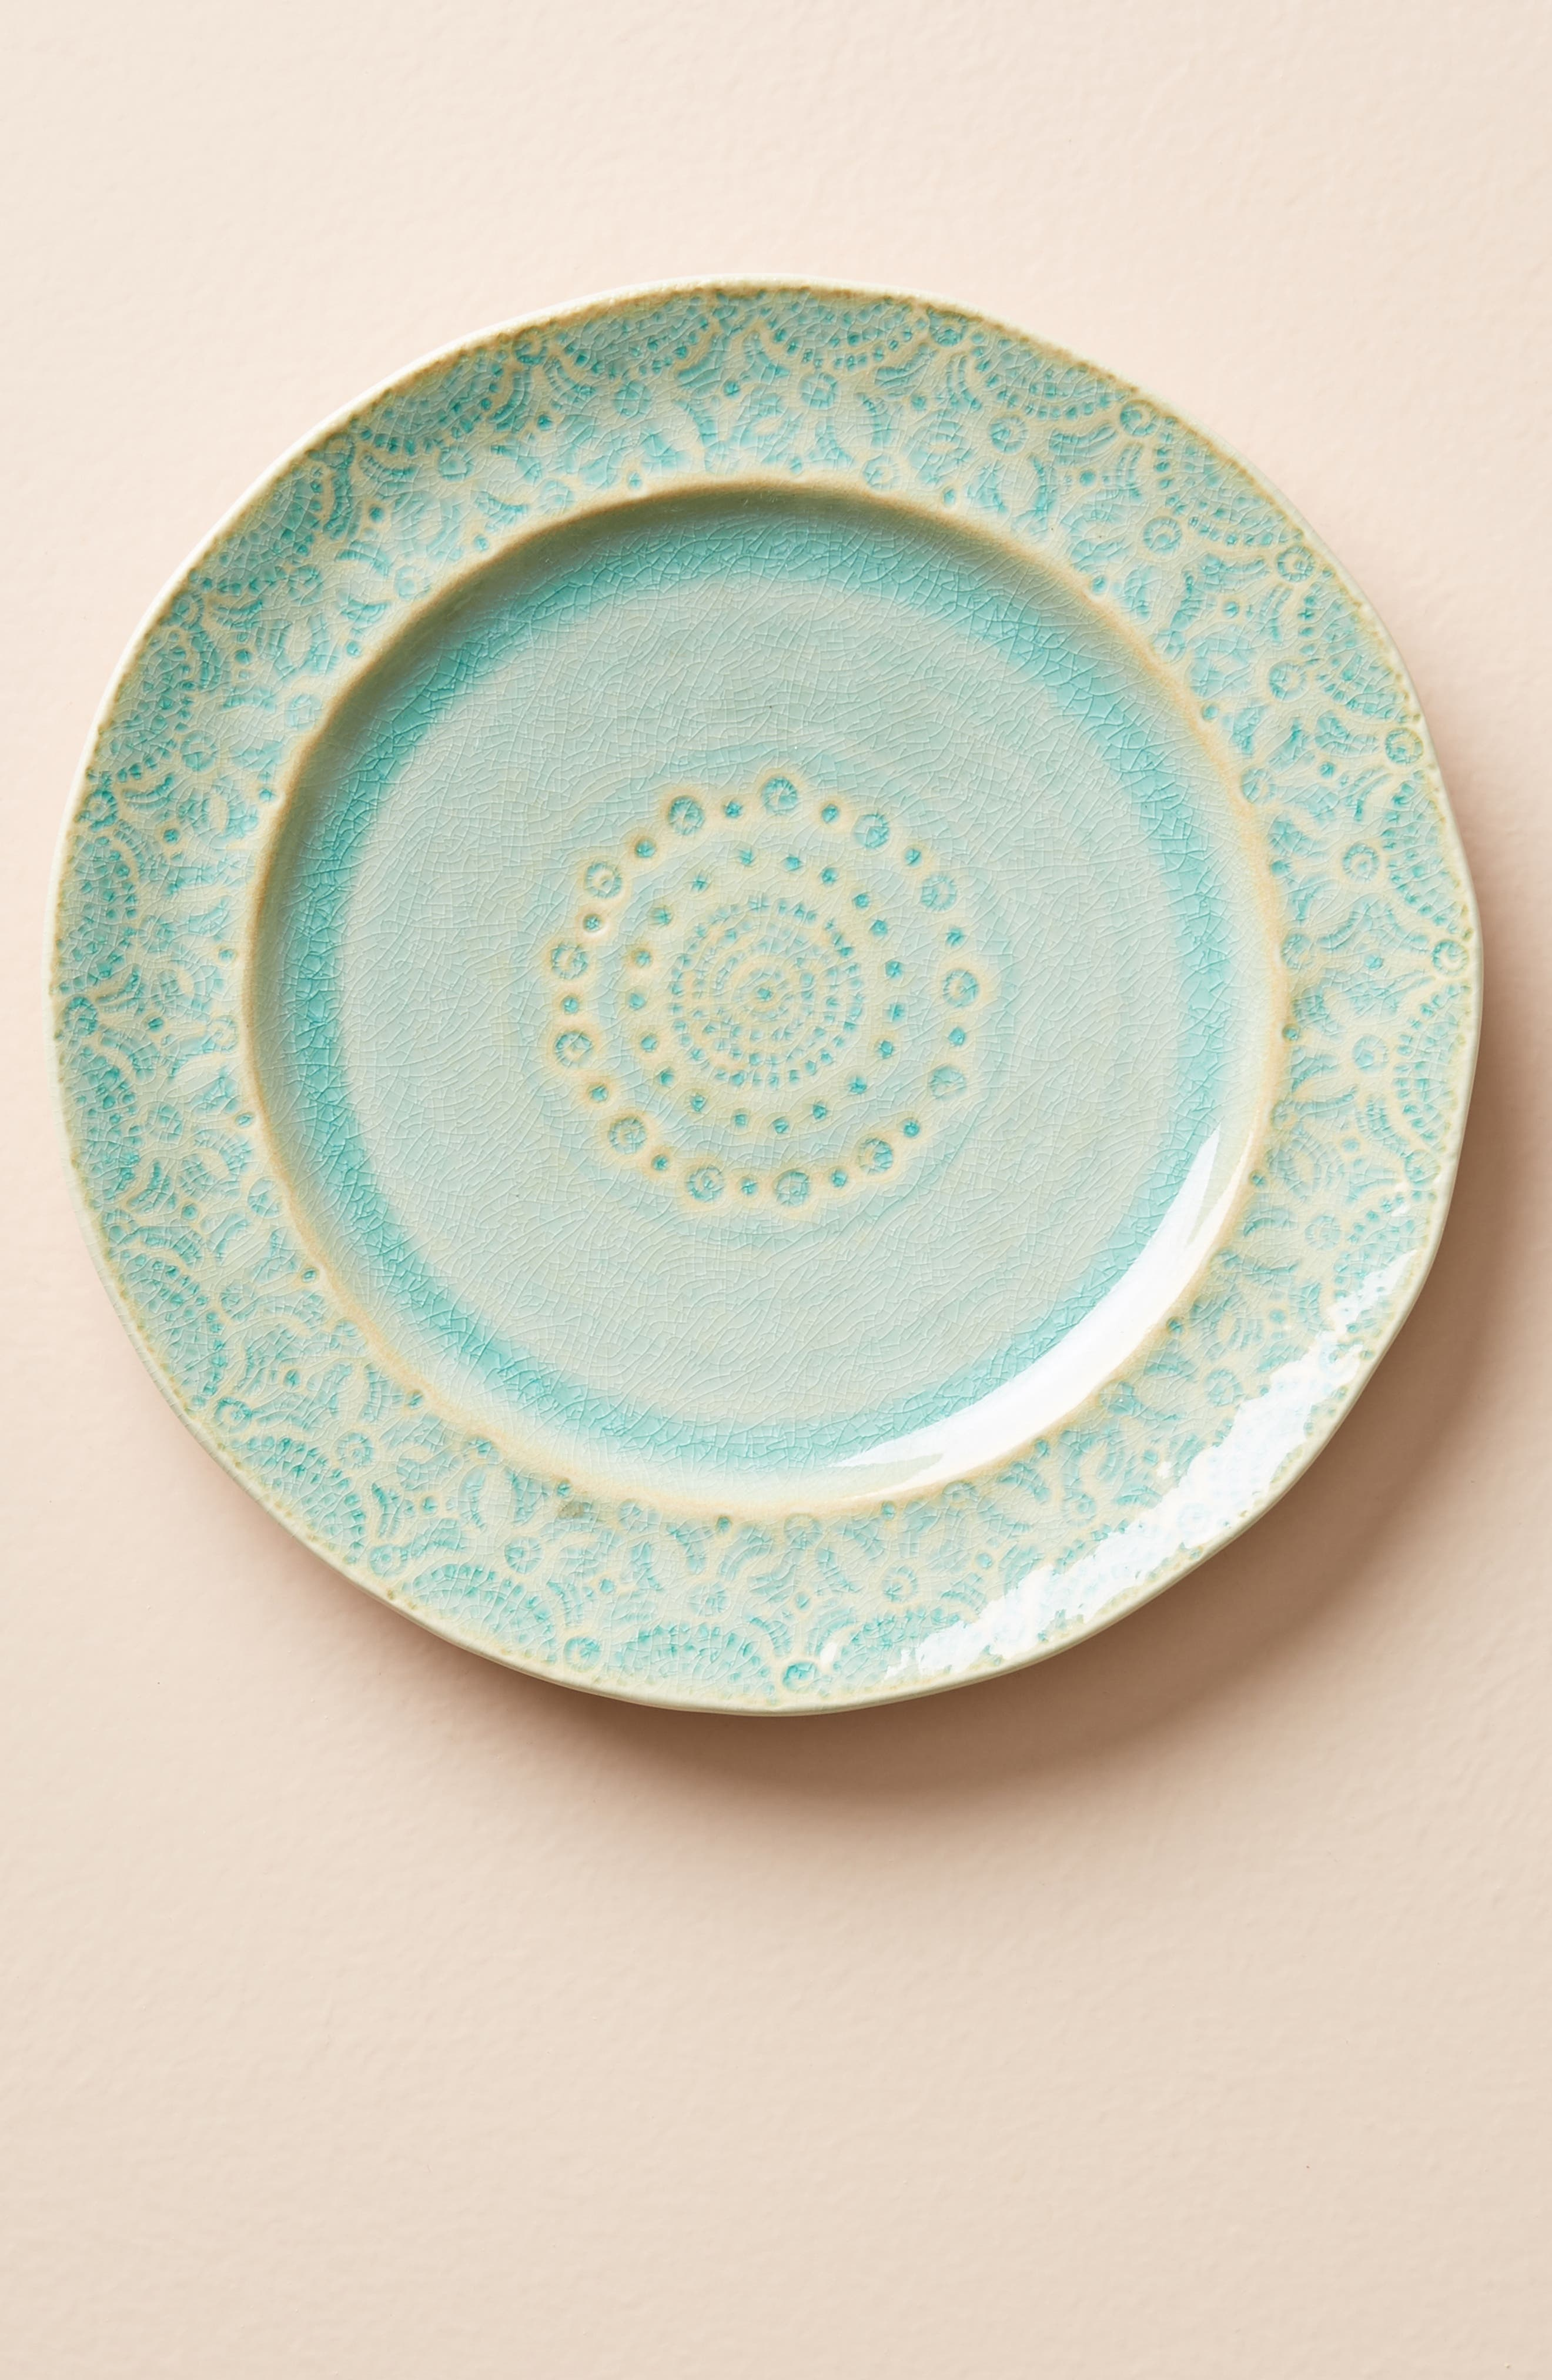 Alternate Image 1 Selected - Anthropologie Old Havana Stoneware Side Plate